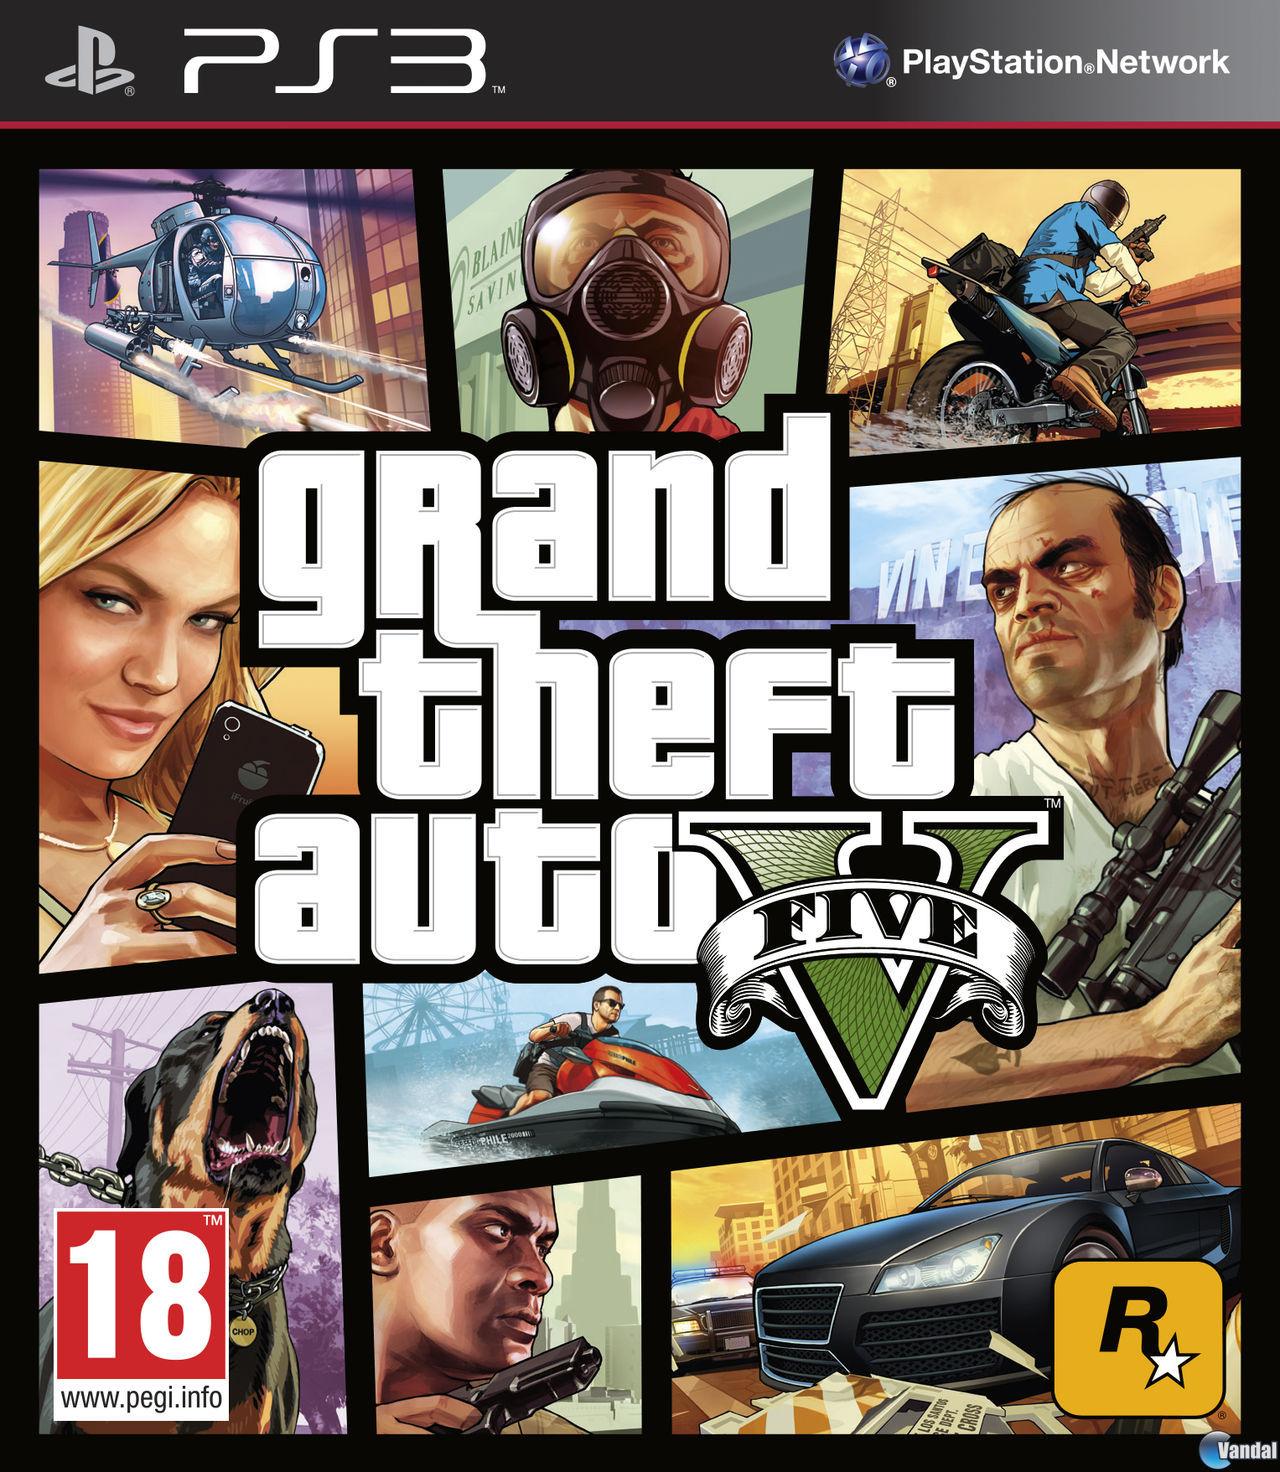 Grand theft auto iii jeu playstation 3 images vid 233 os astuces et